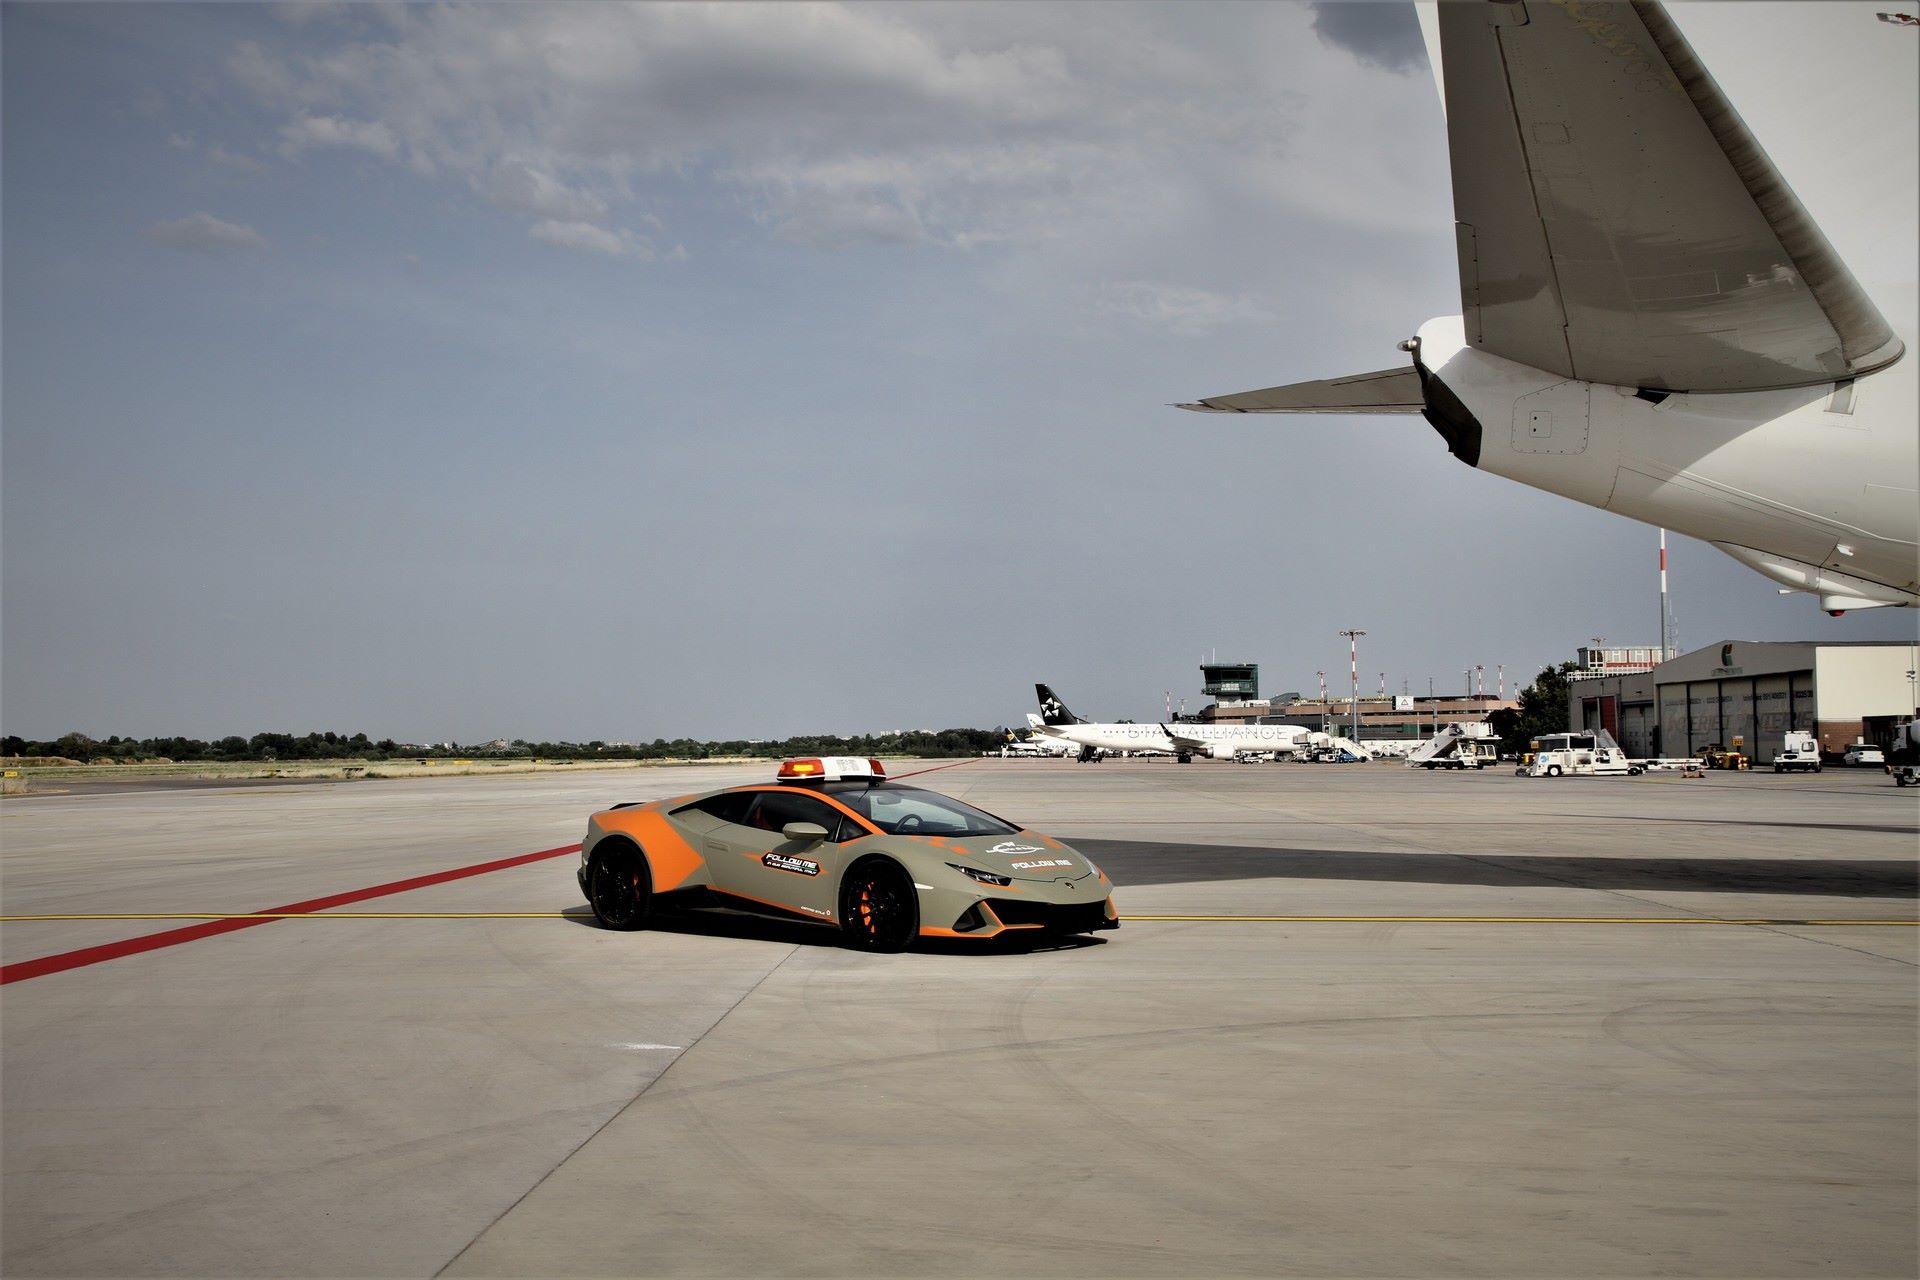 Lamborghini-Huracan-Evo-Follow-Me-bologna-airport-2021-7